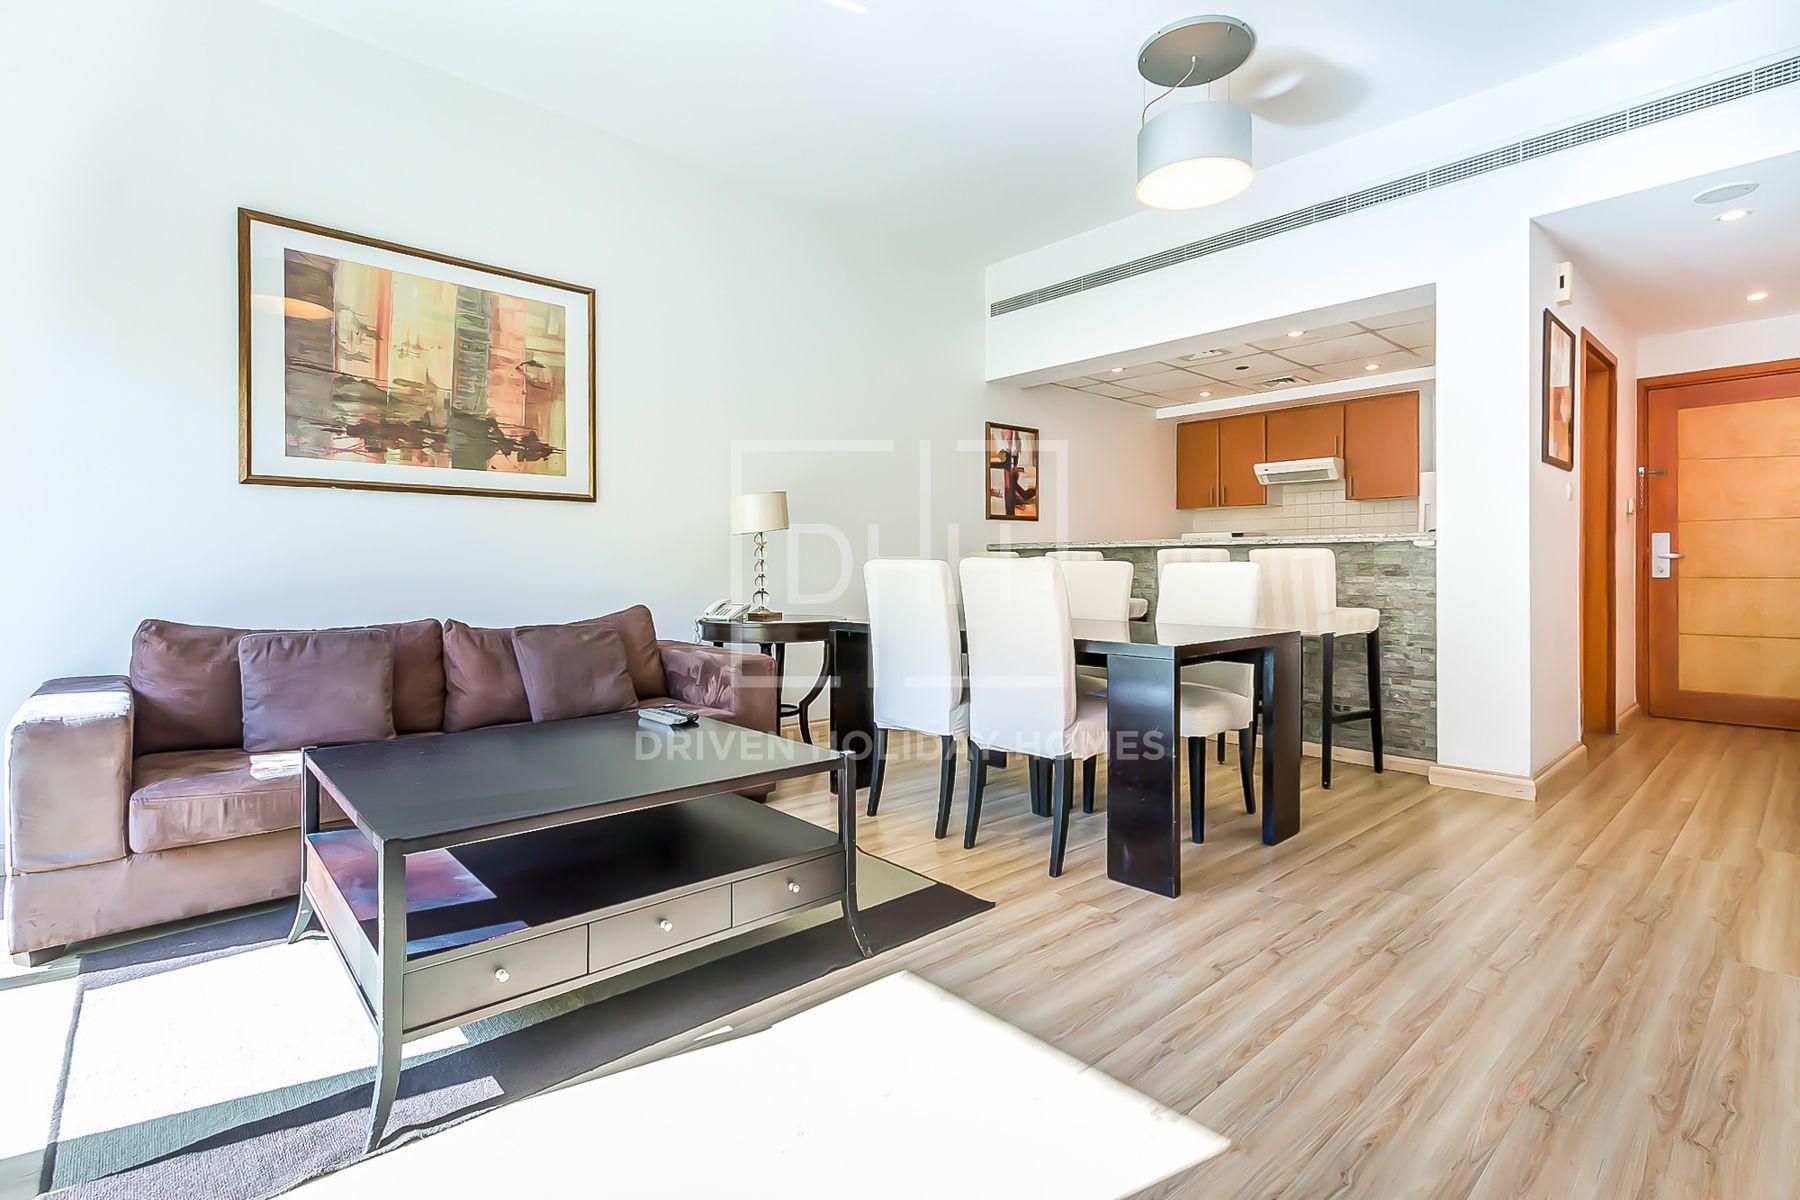 Apartment for Rent in Al Alka 1 - Greens